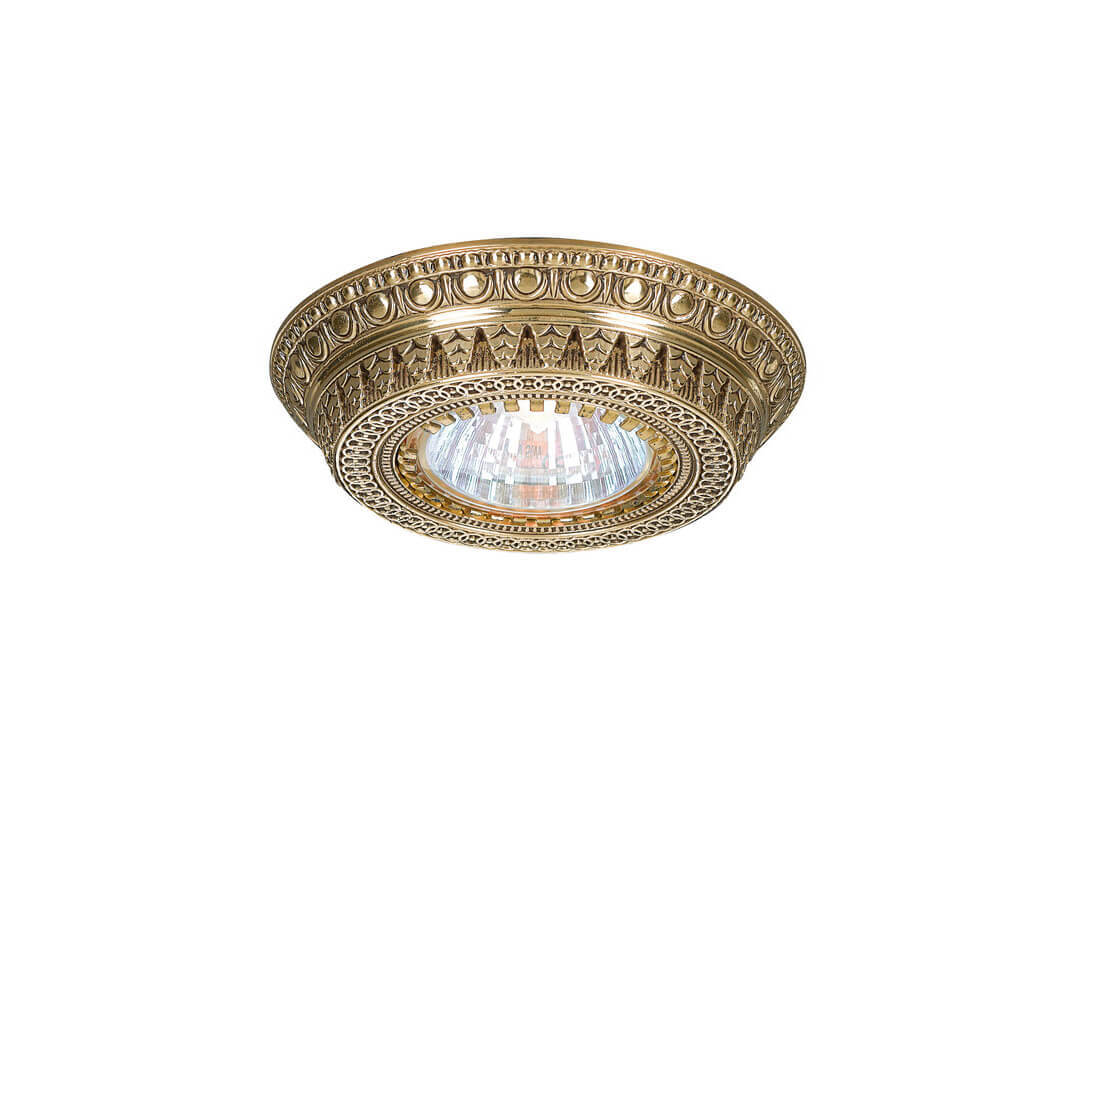 Светильник Reccagni Angelo SPOT 1097 oro rosa SPOT светильник reccagni angelo spot 1082 bronzo rosa spot